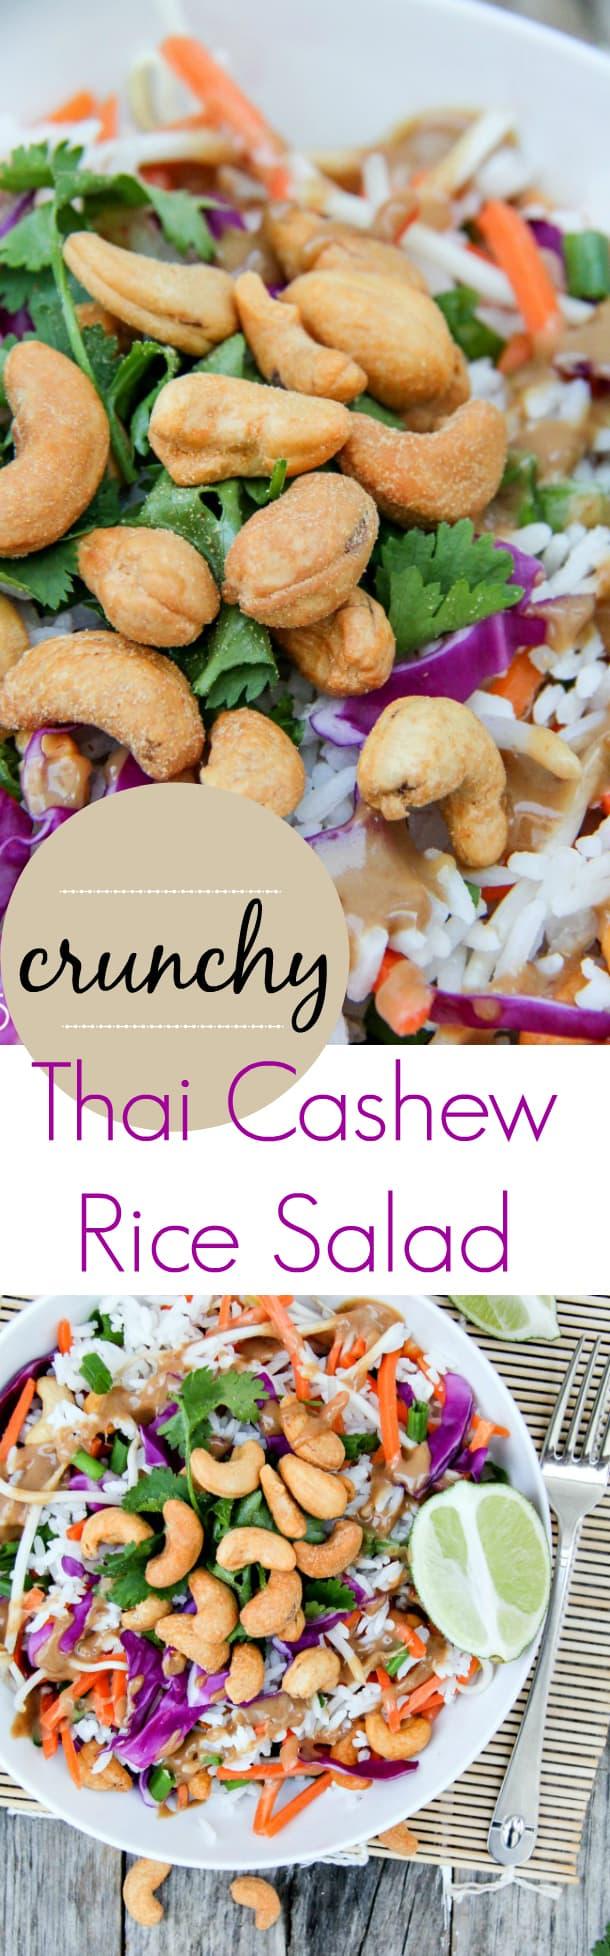 a-crunchy-thai-cashew-rice-salad-recipe